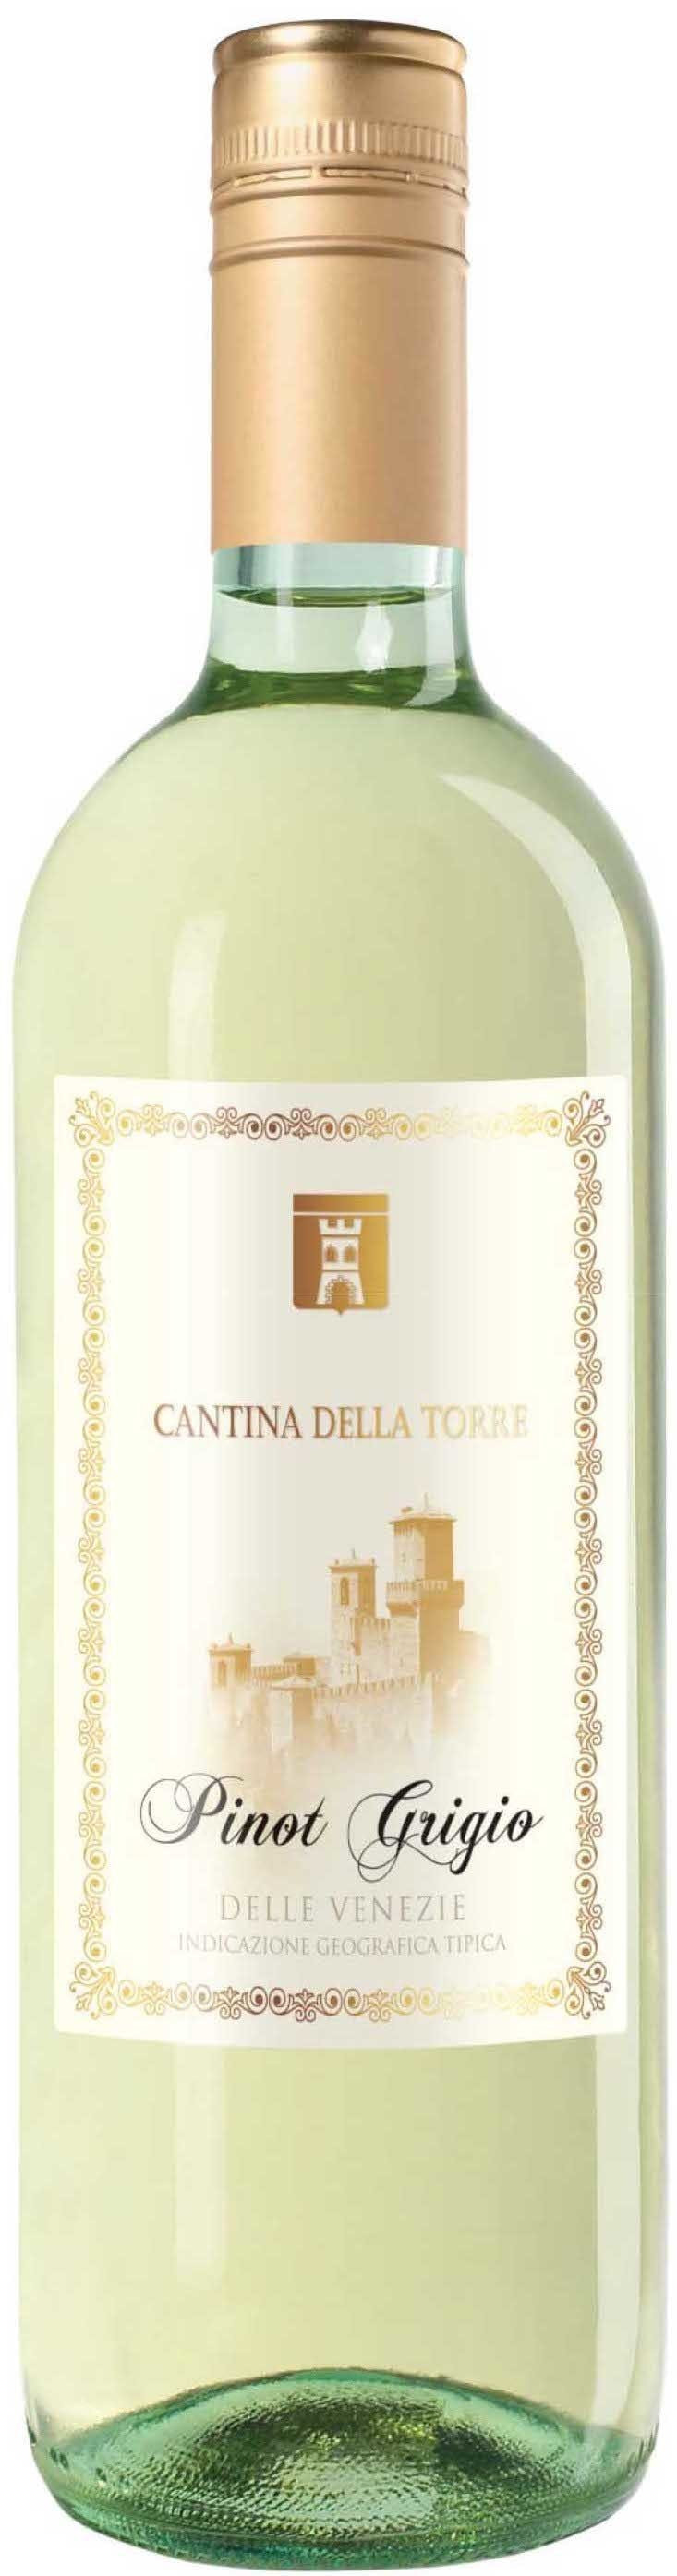 Cantina Della Torre Pinot Grigo 750ml